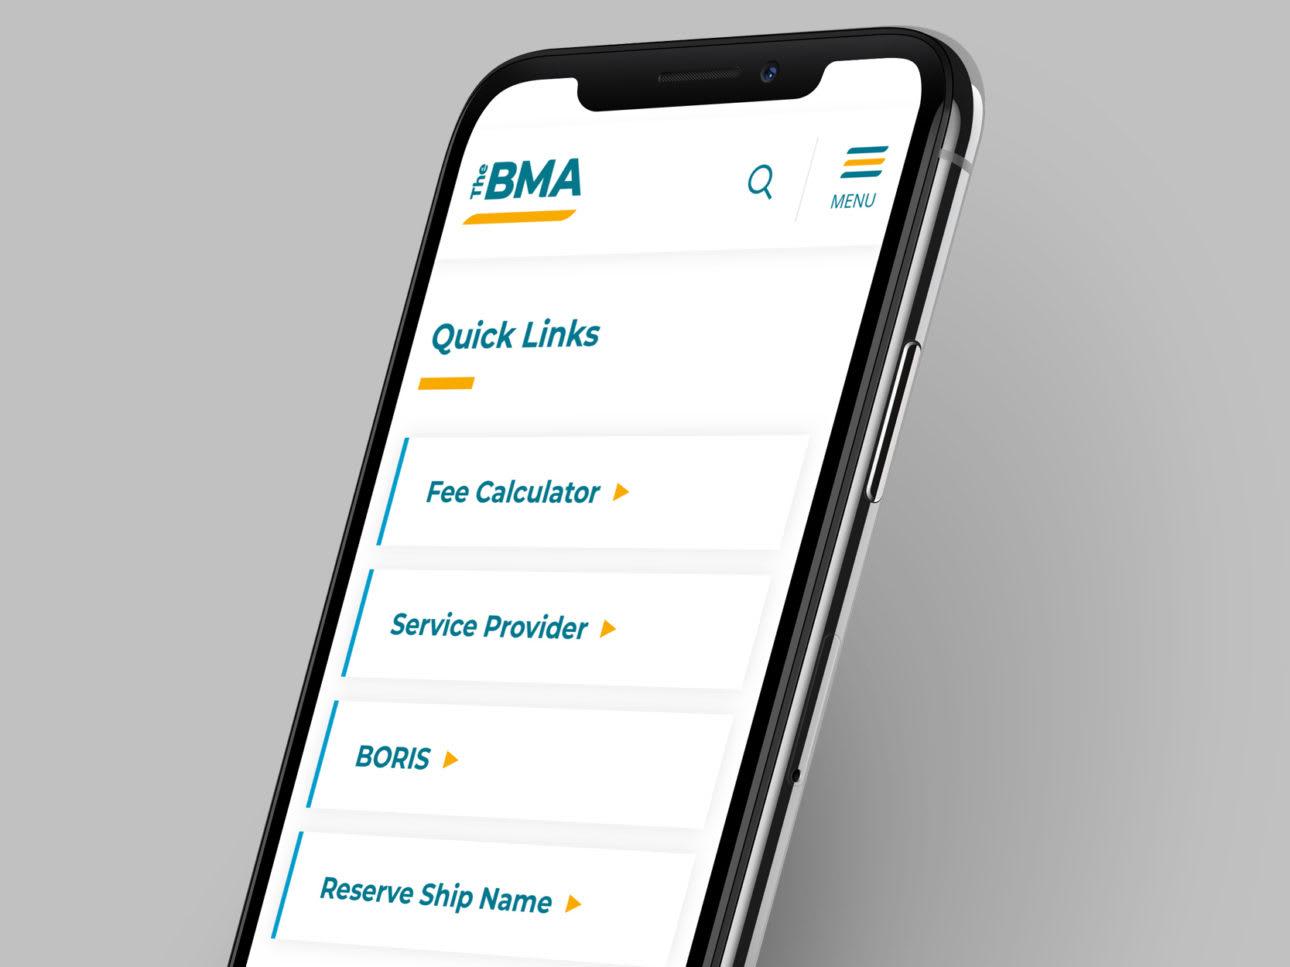 BMA Image2